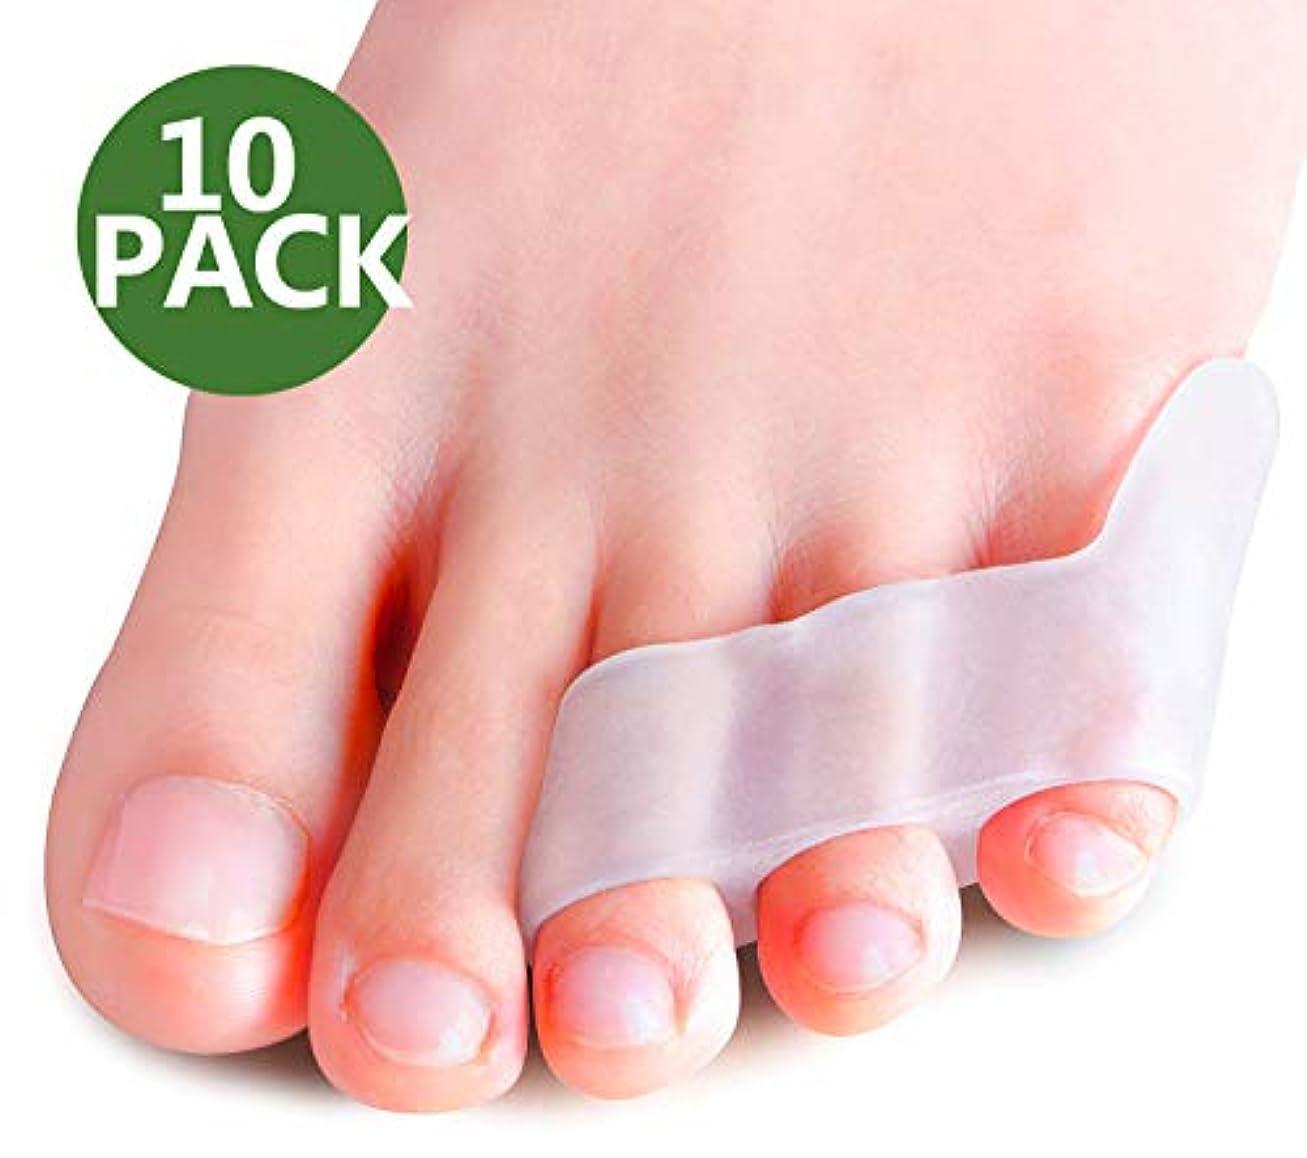 Povihome 10X 足の小指 サポーター,足の小指保護